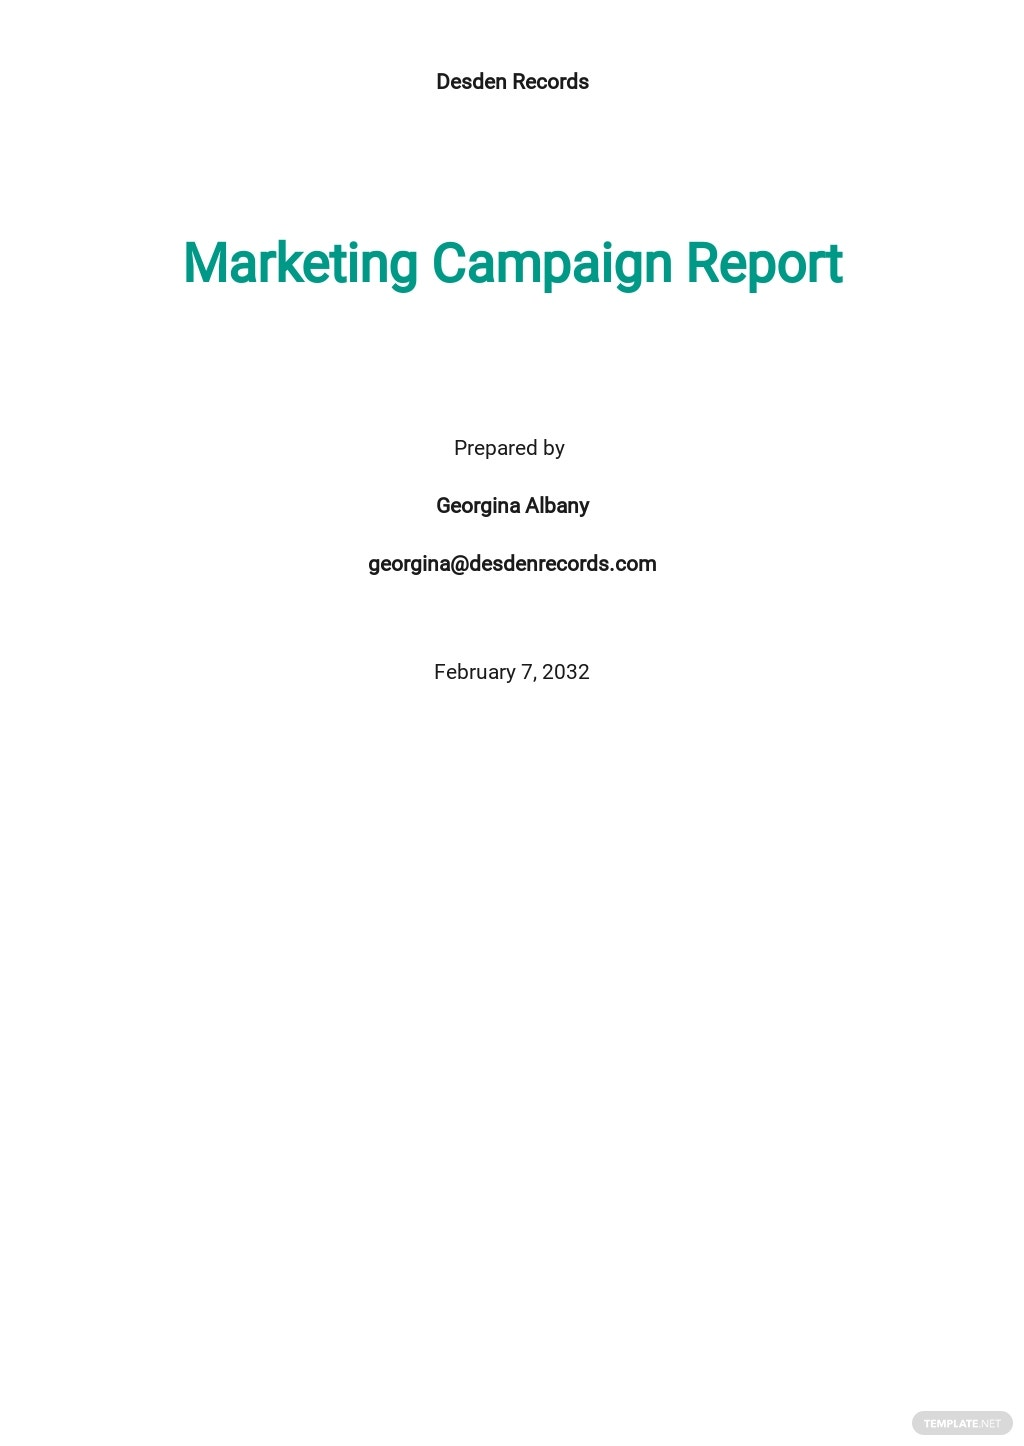 Marketing Campaign Report Template